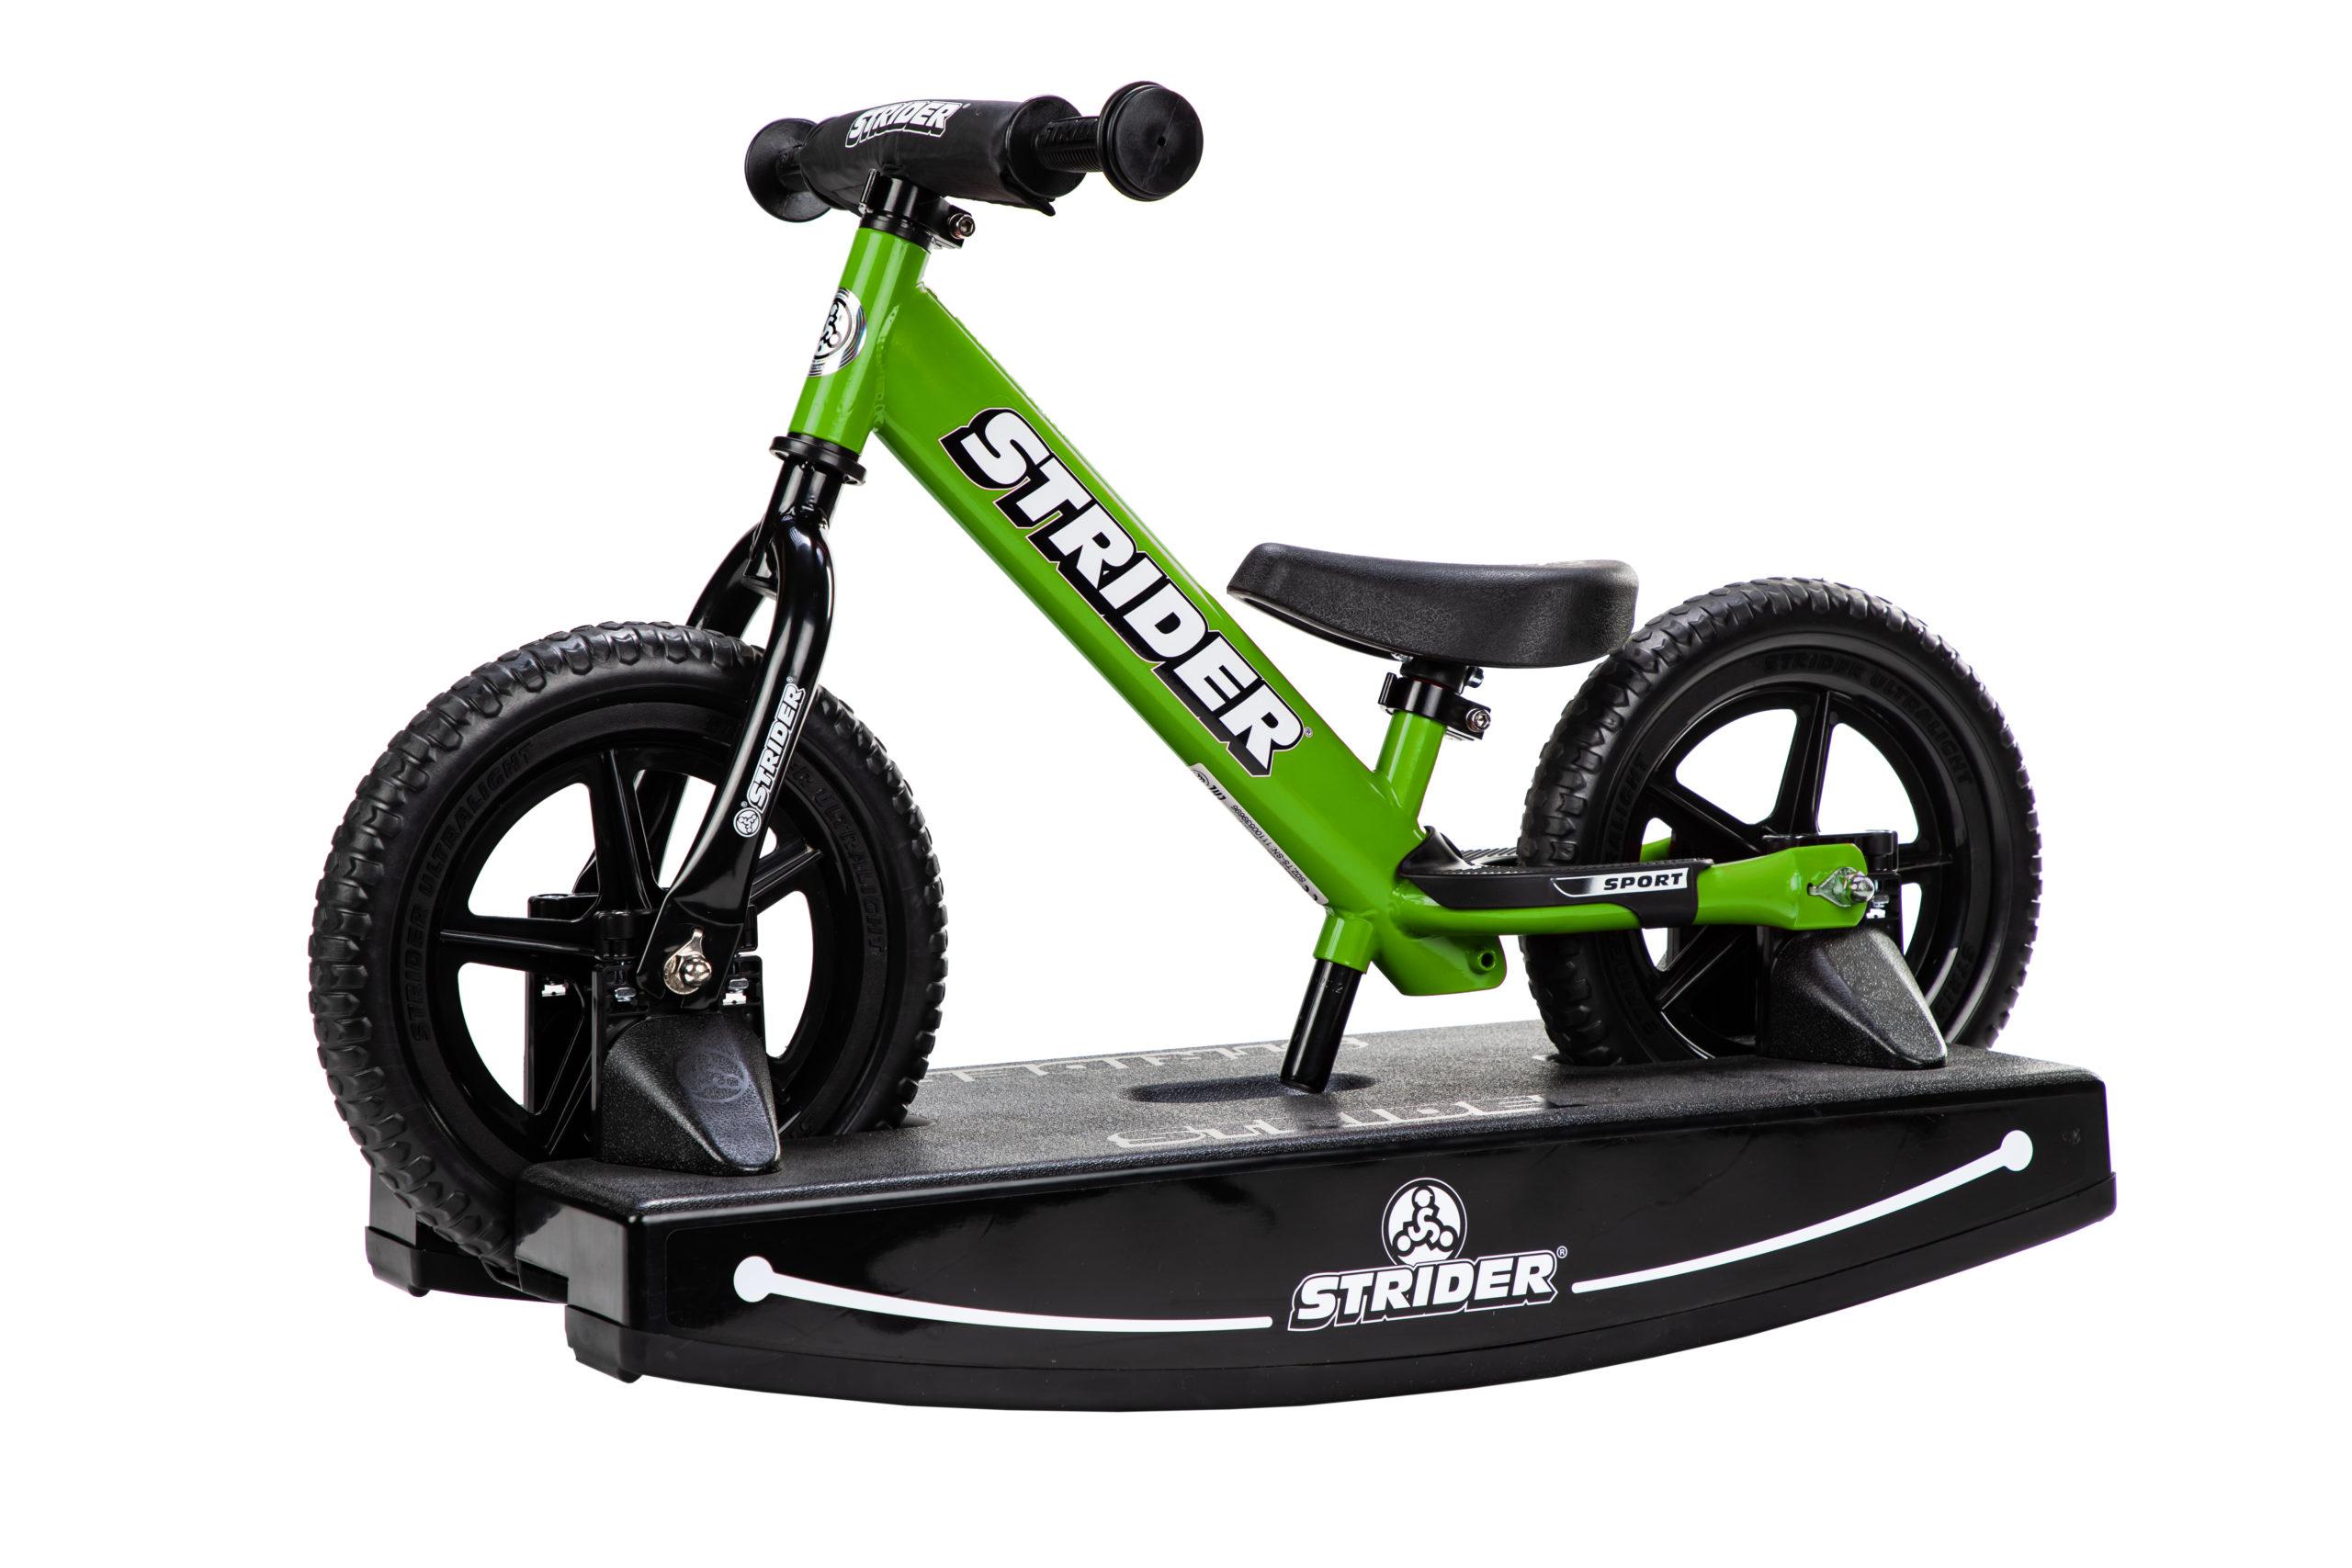 Studio Image of green 12 Sport 2-in-1 Rocking Bike